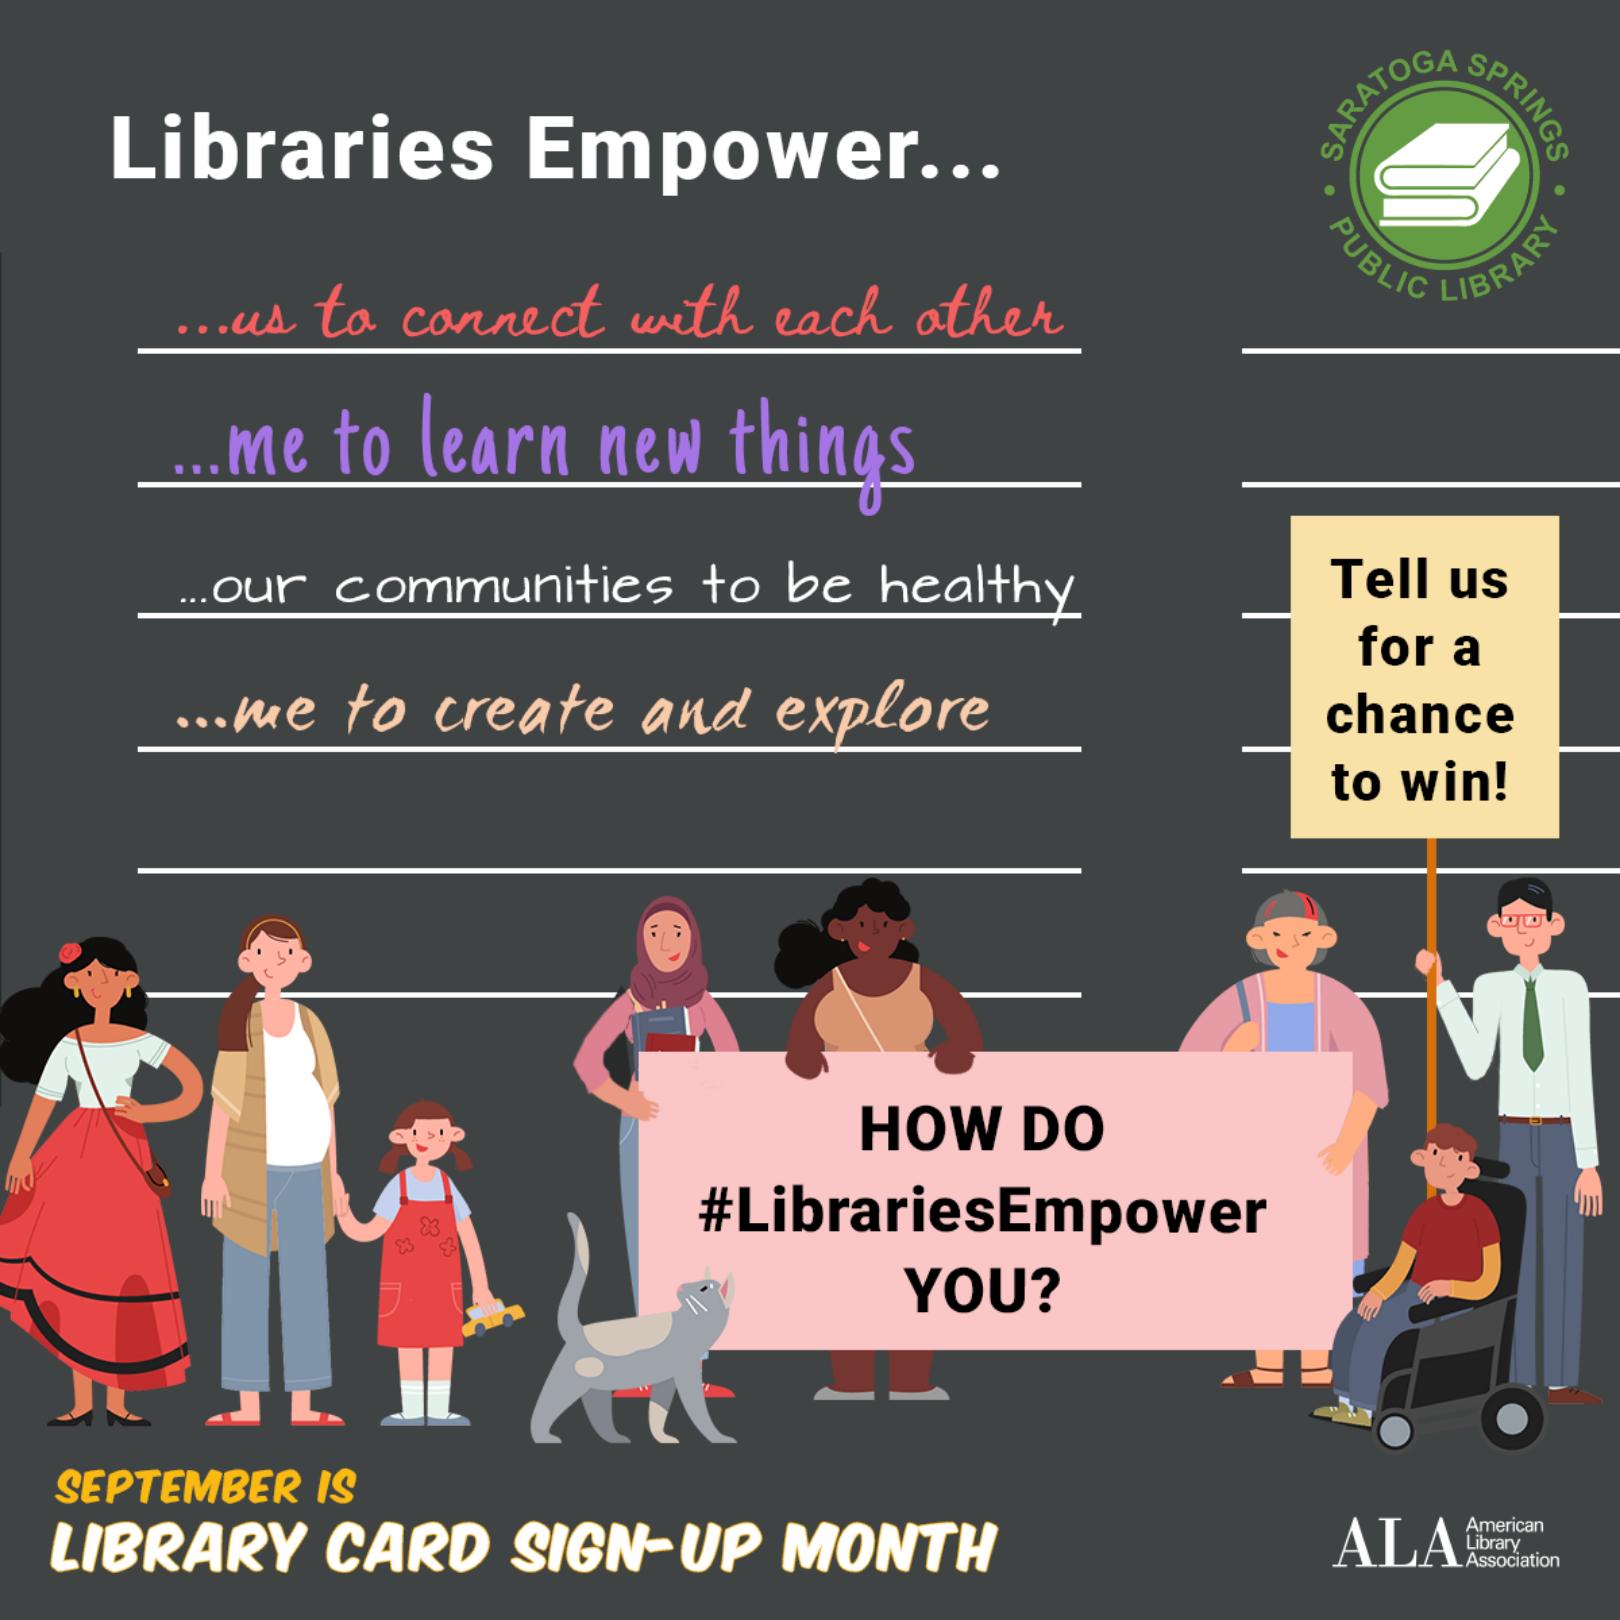 #LibrariesEmpower this September!